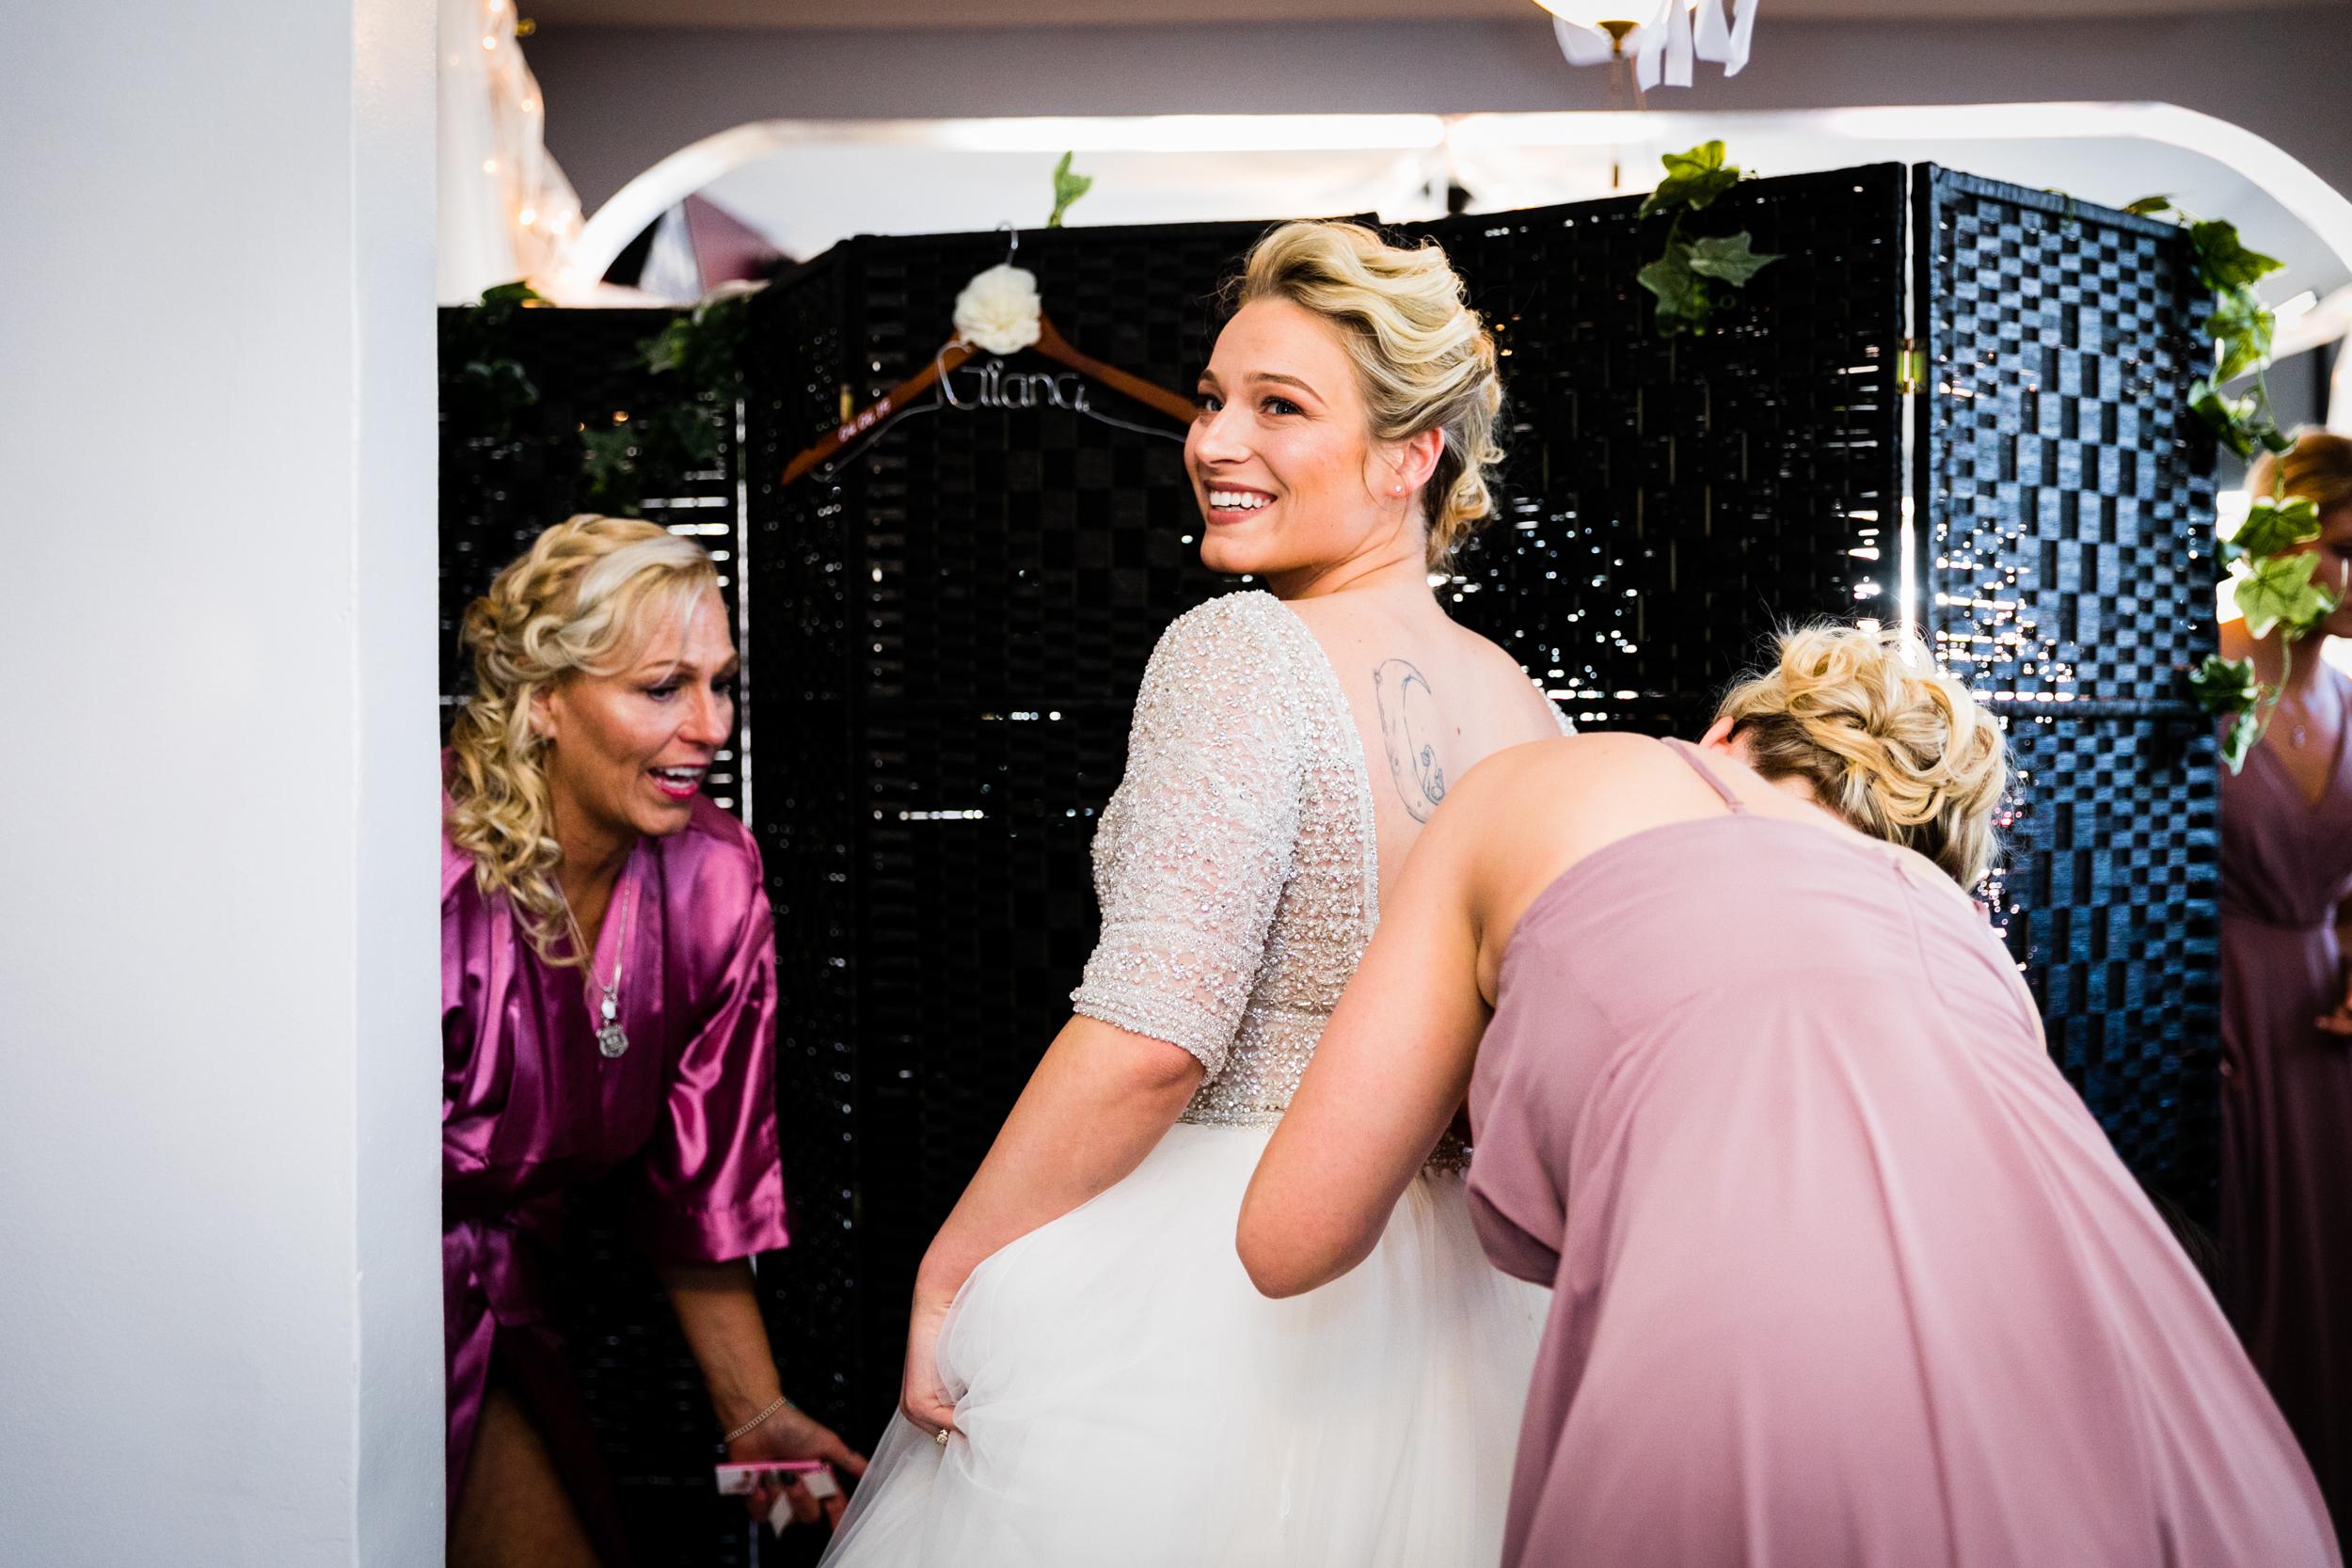 CELEBRATIONS BENSALEM WEDDING PHOTOGRAPHY-31.jpg